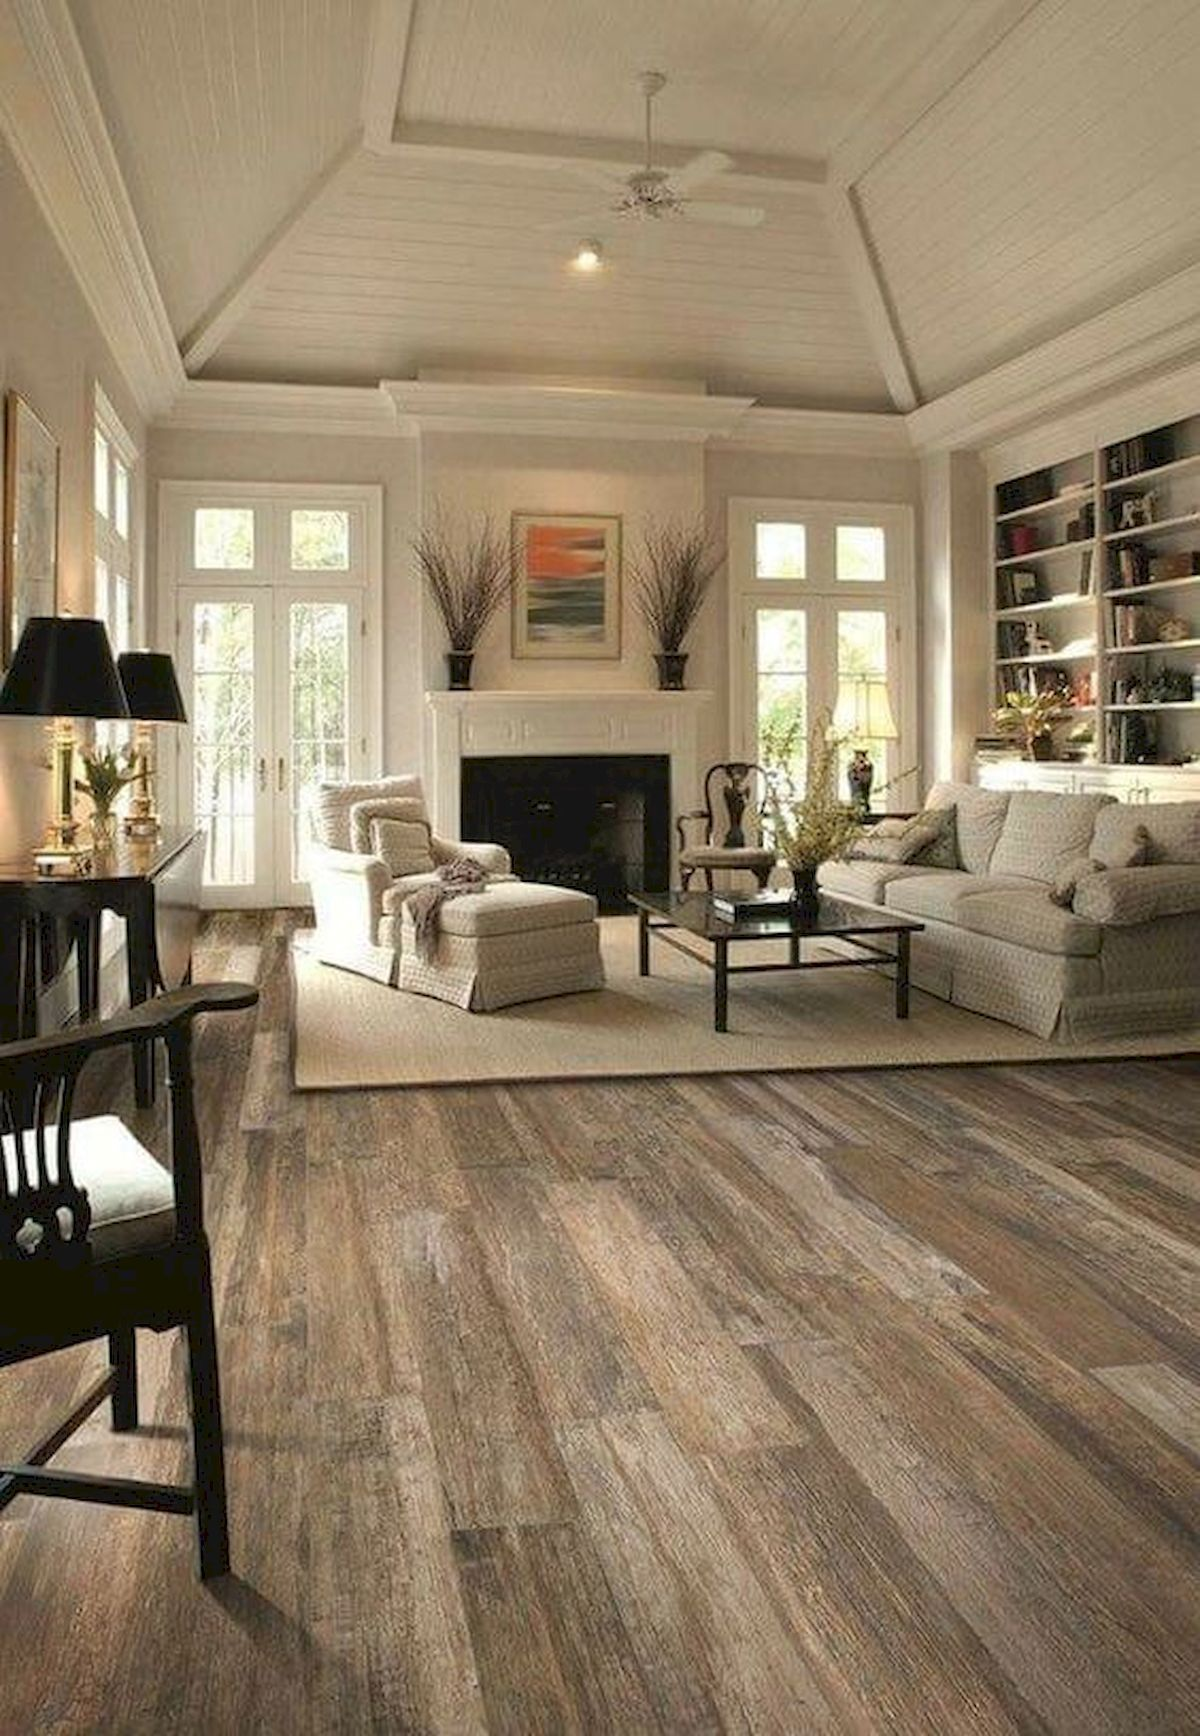 Cool 30 Elegant Farmhouse Living Room Decor Ideas Roomadness